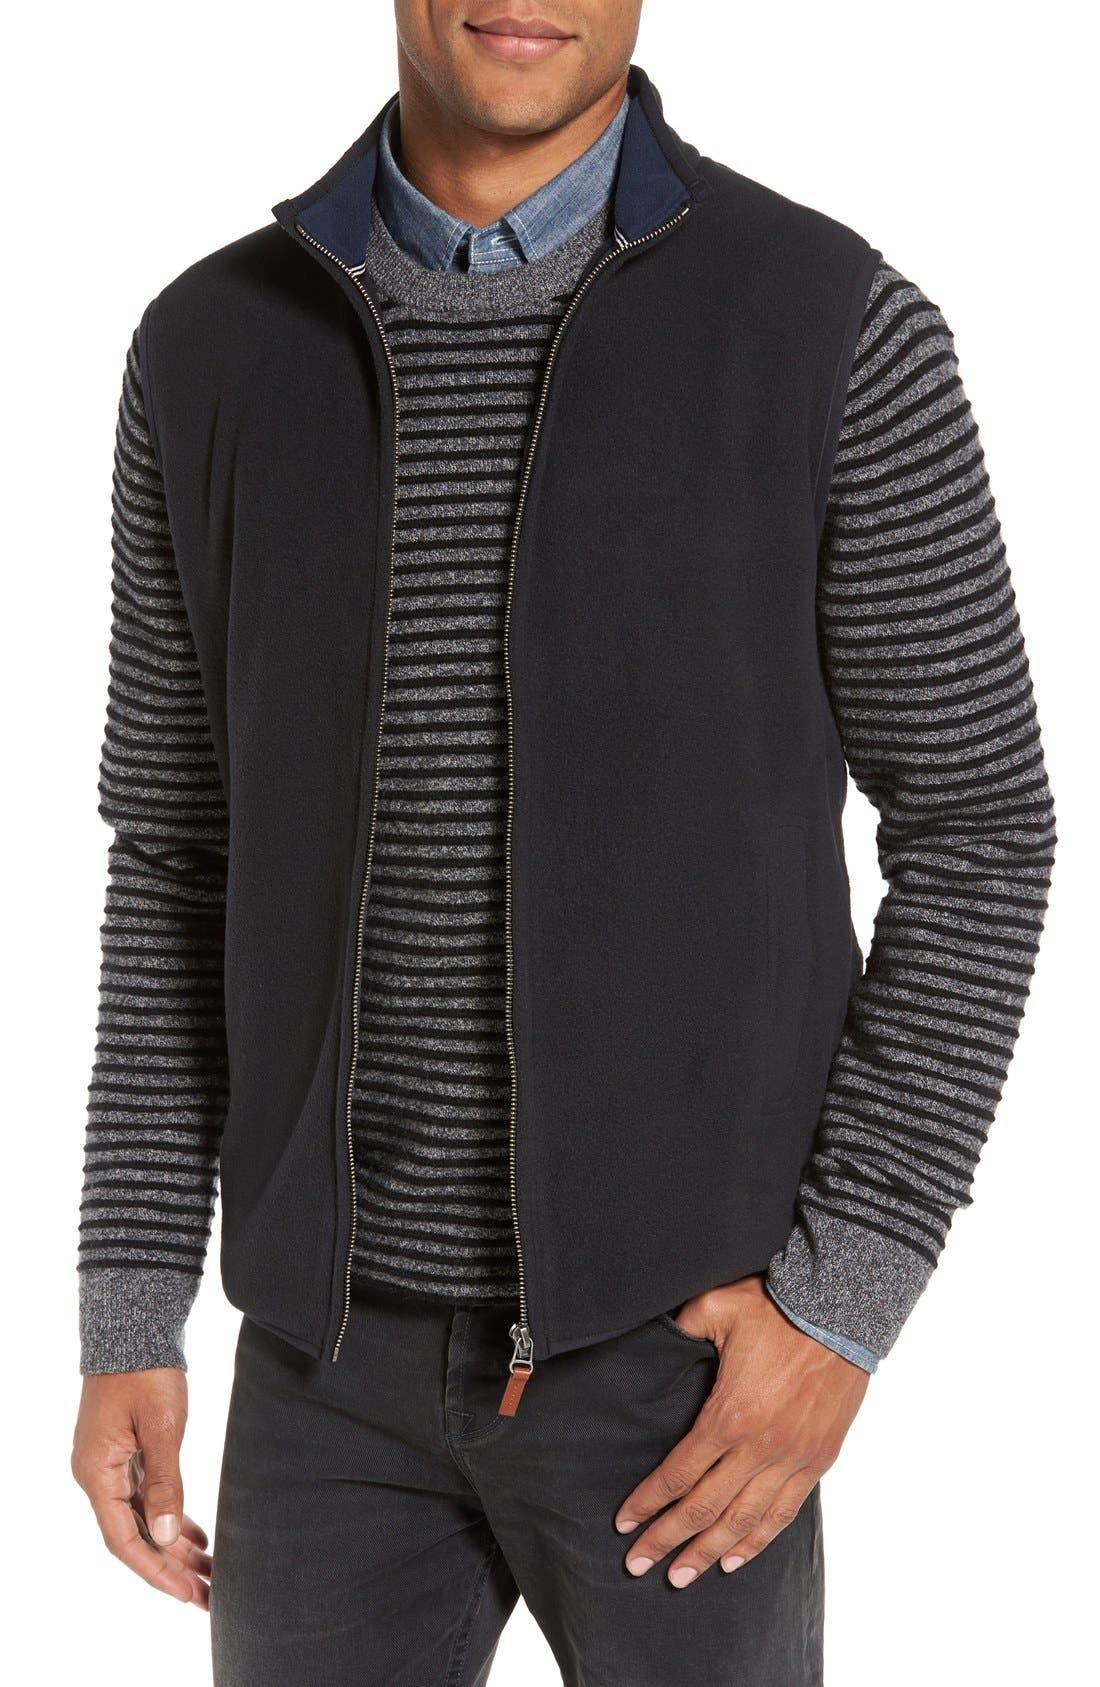 Alternate Image 1 Selected - Nordstrom Men's Shop Polar Fleece Vest (Regular & Tall)